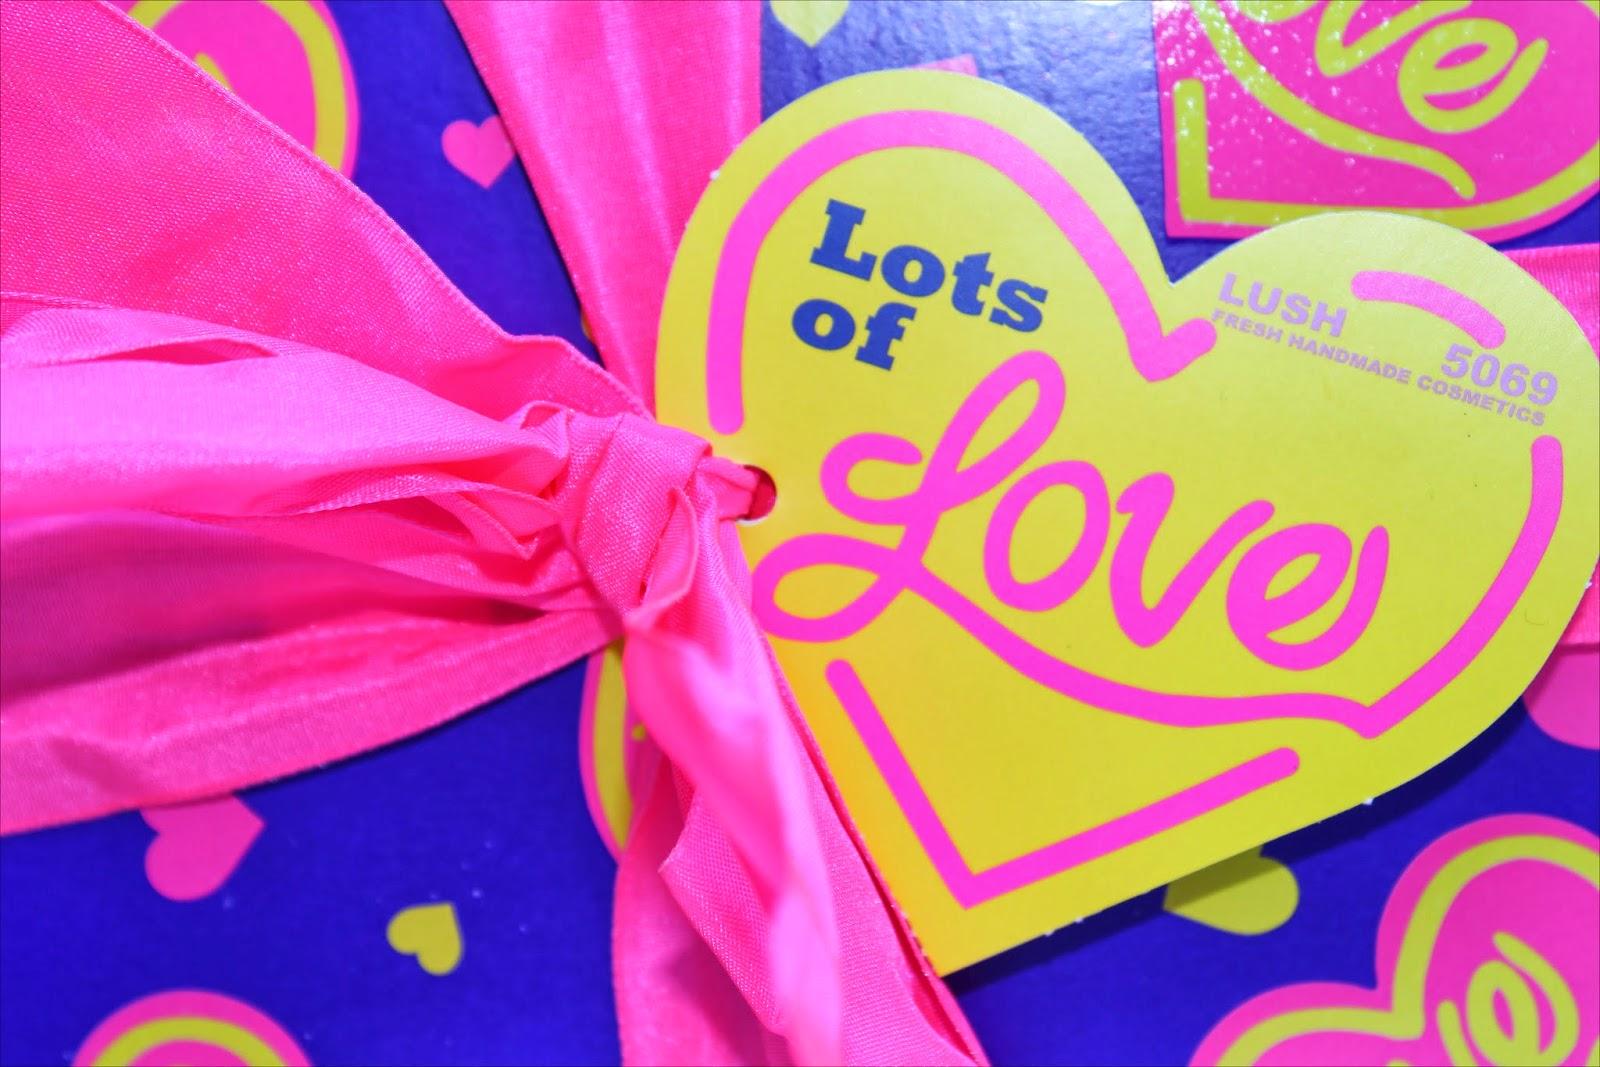 Lush Lots of Love Gift Box